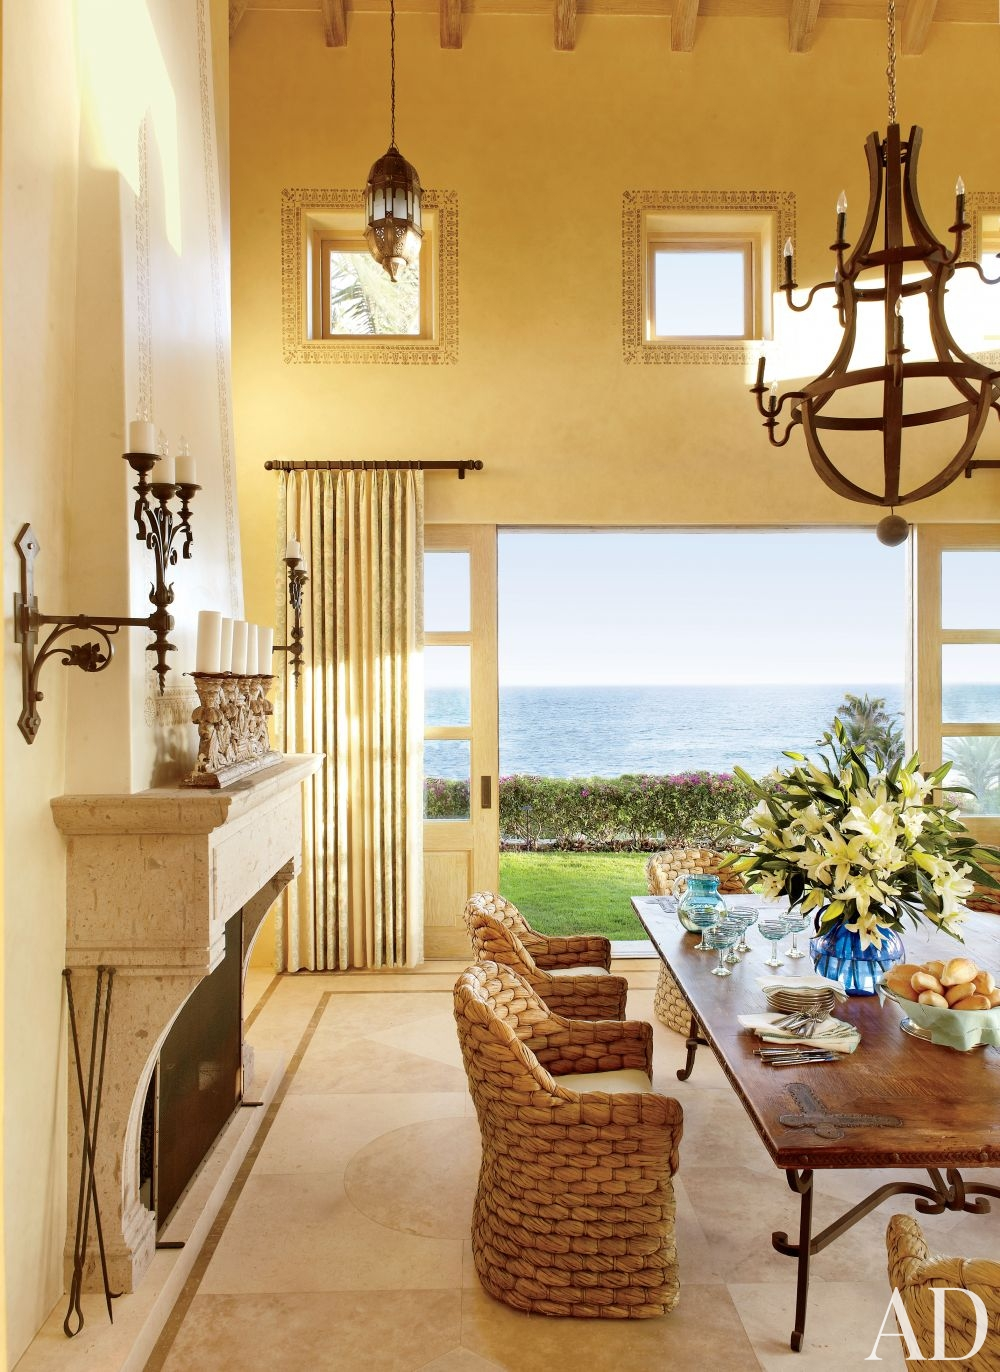 exotic-dining-room-marshall-watson-interiors-san-jos-del-cabo-mexico-201305-3_1000-watermarked